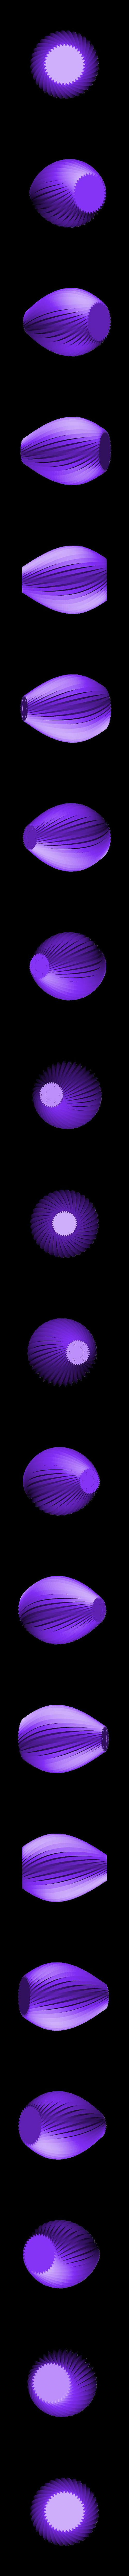 shade_255mm_tall.stl Download free STL file Hanging lamp shade • 3D printing design, idig3d